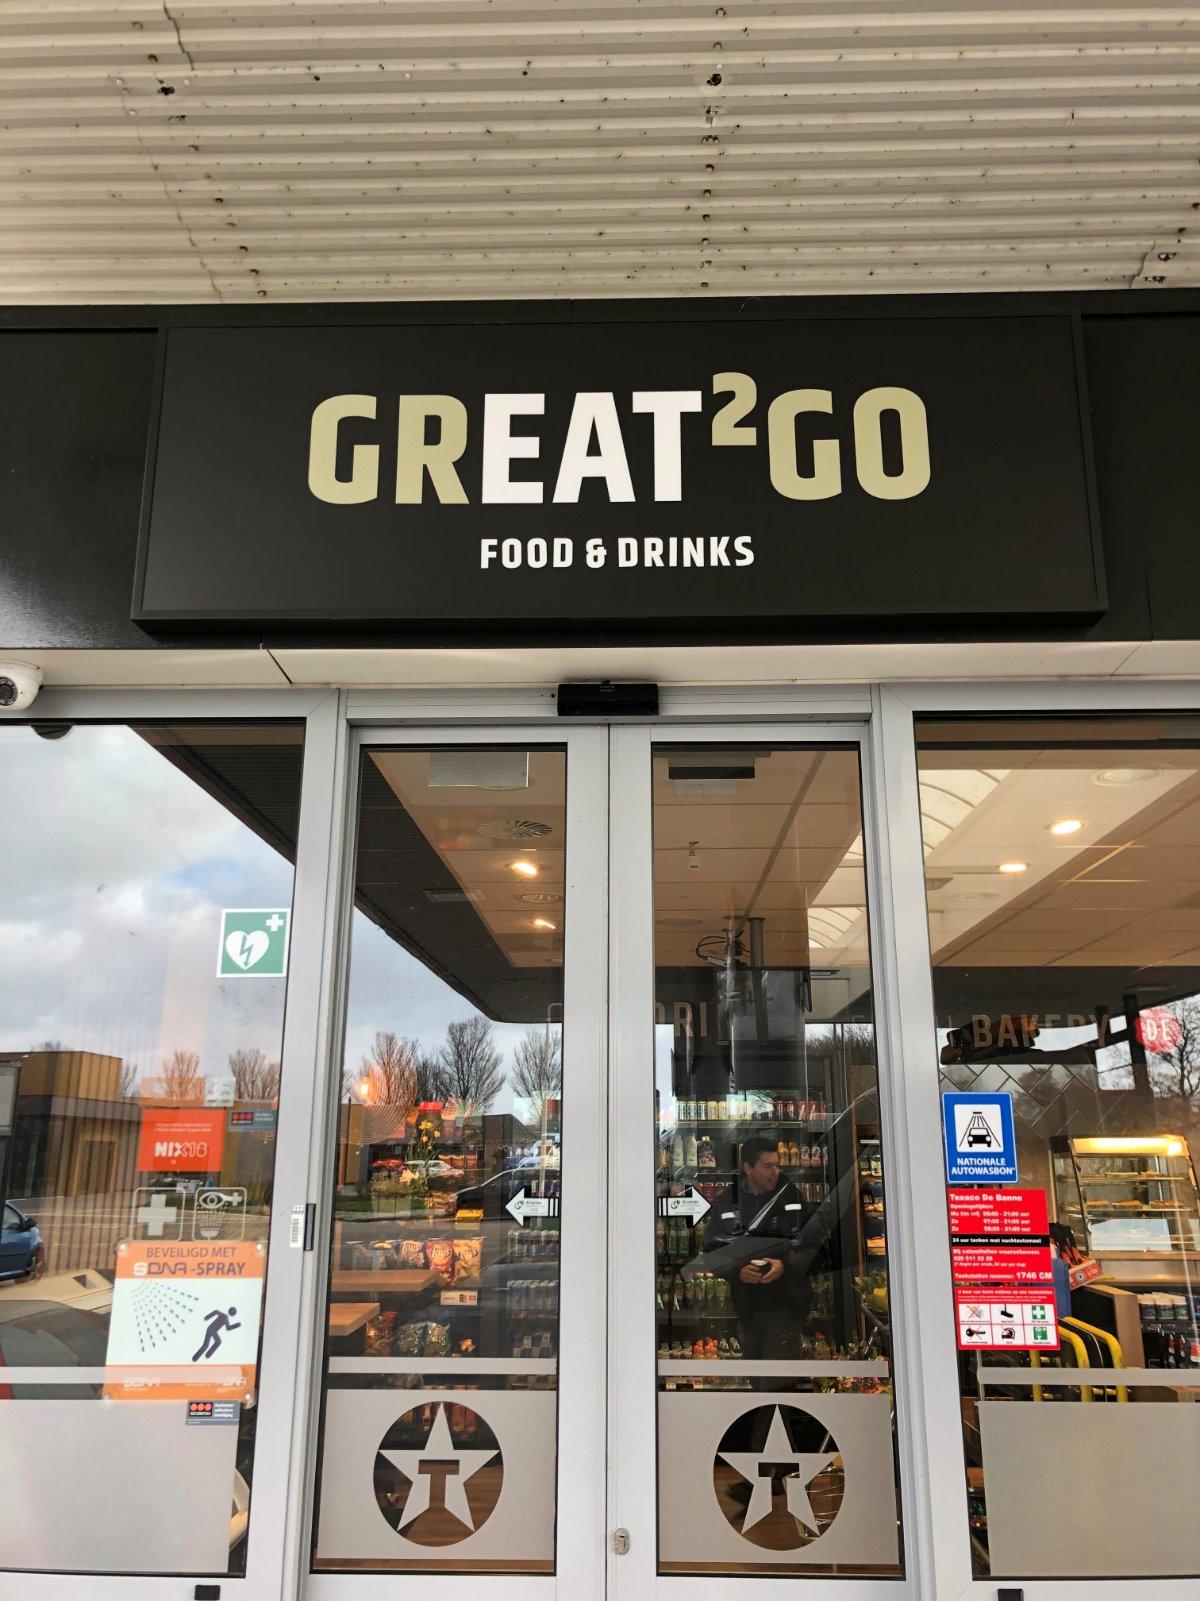 Texaco Great2go winkelconcept